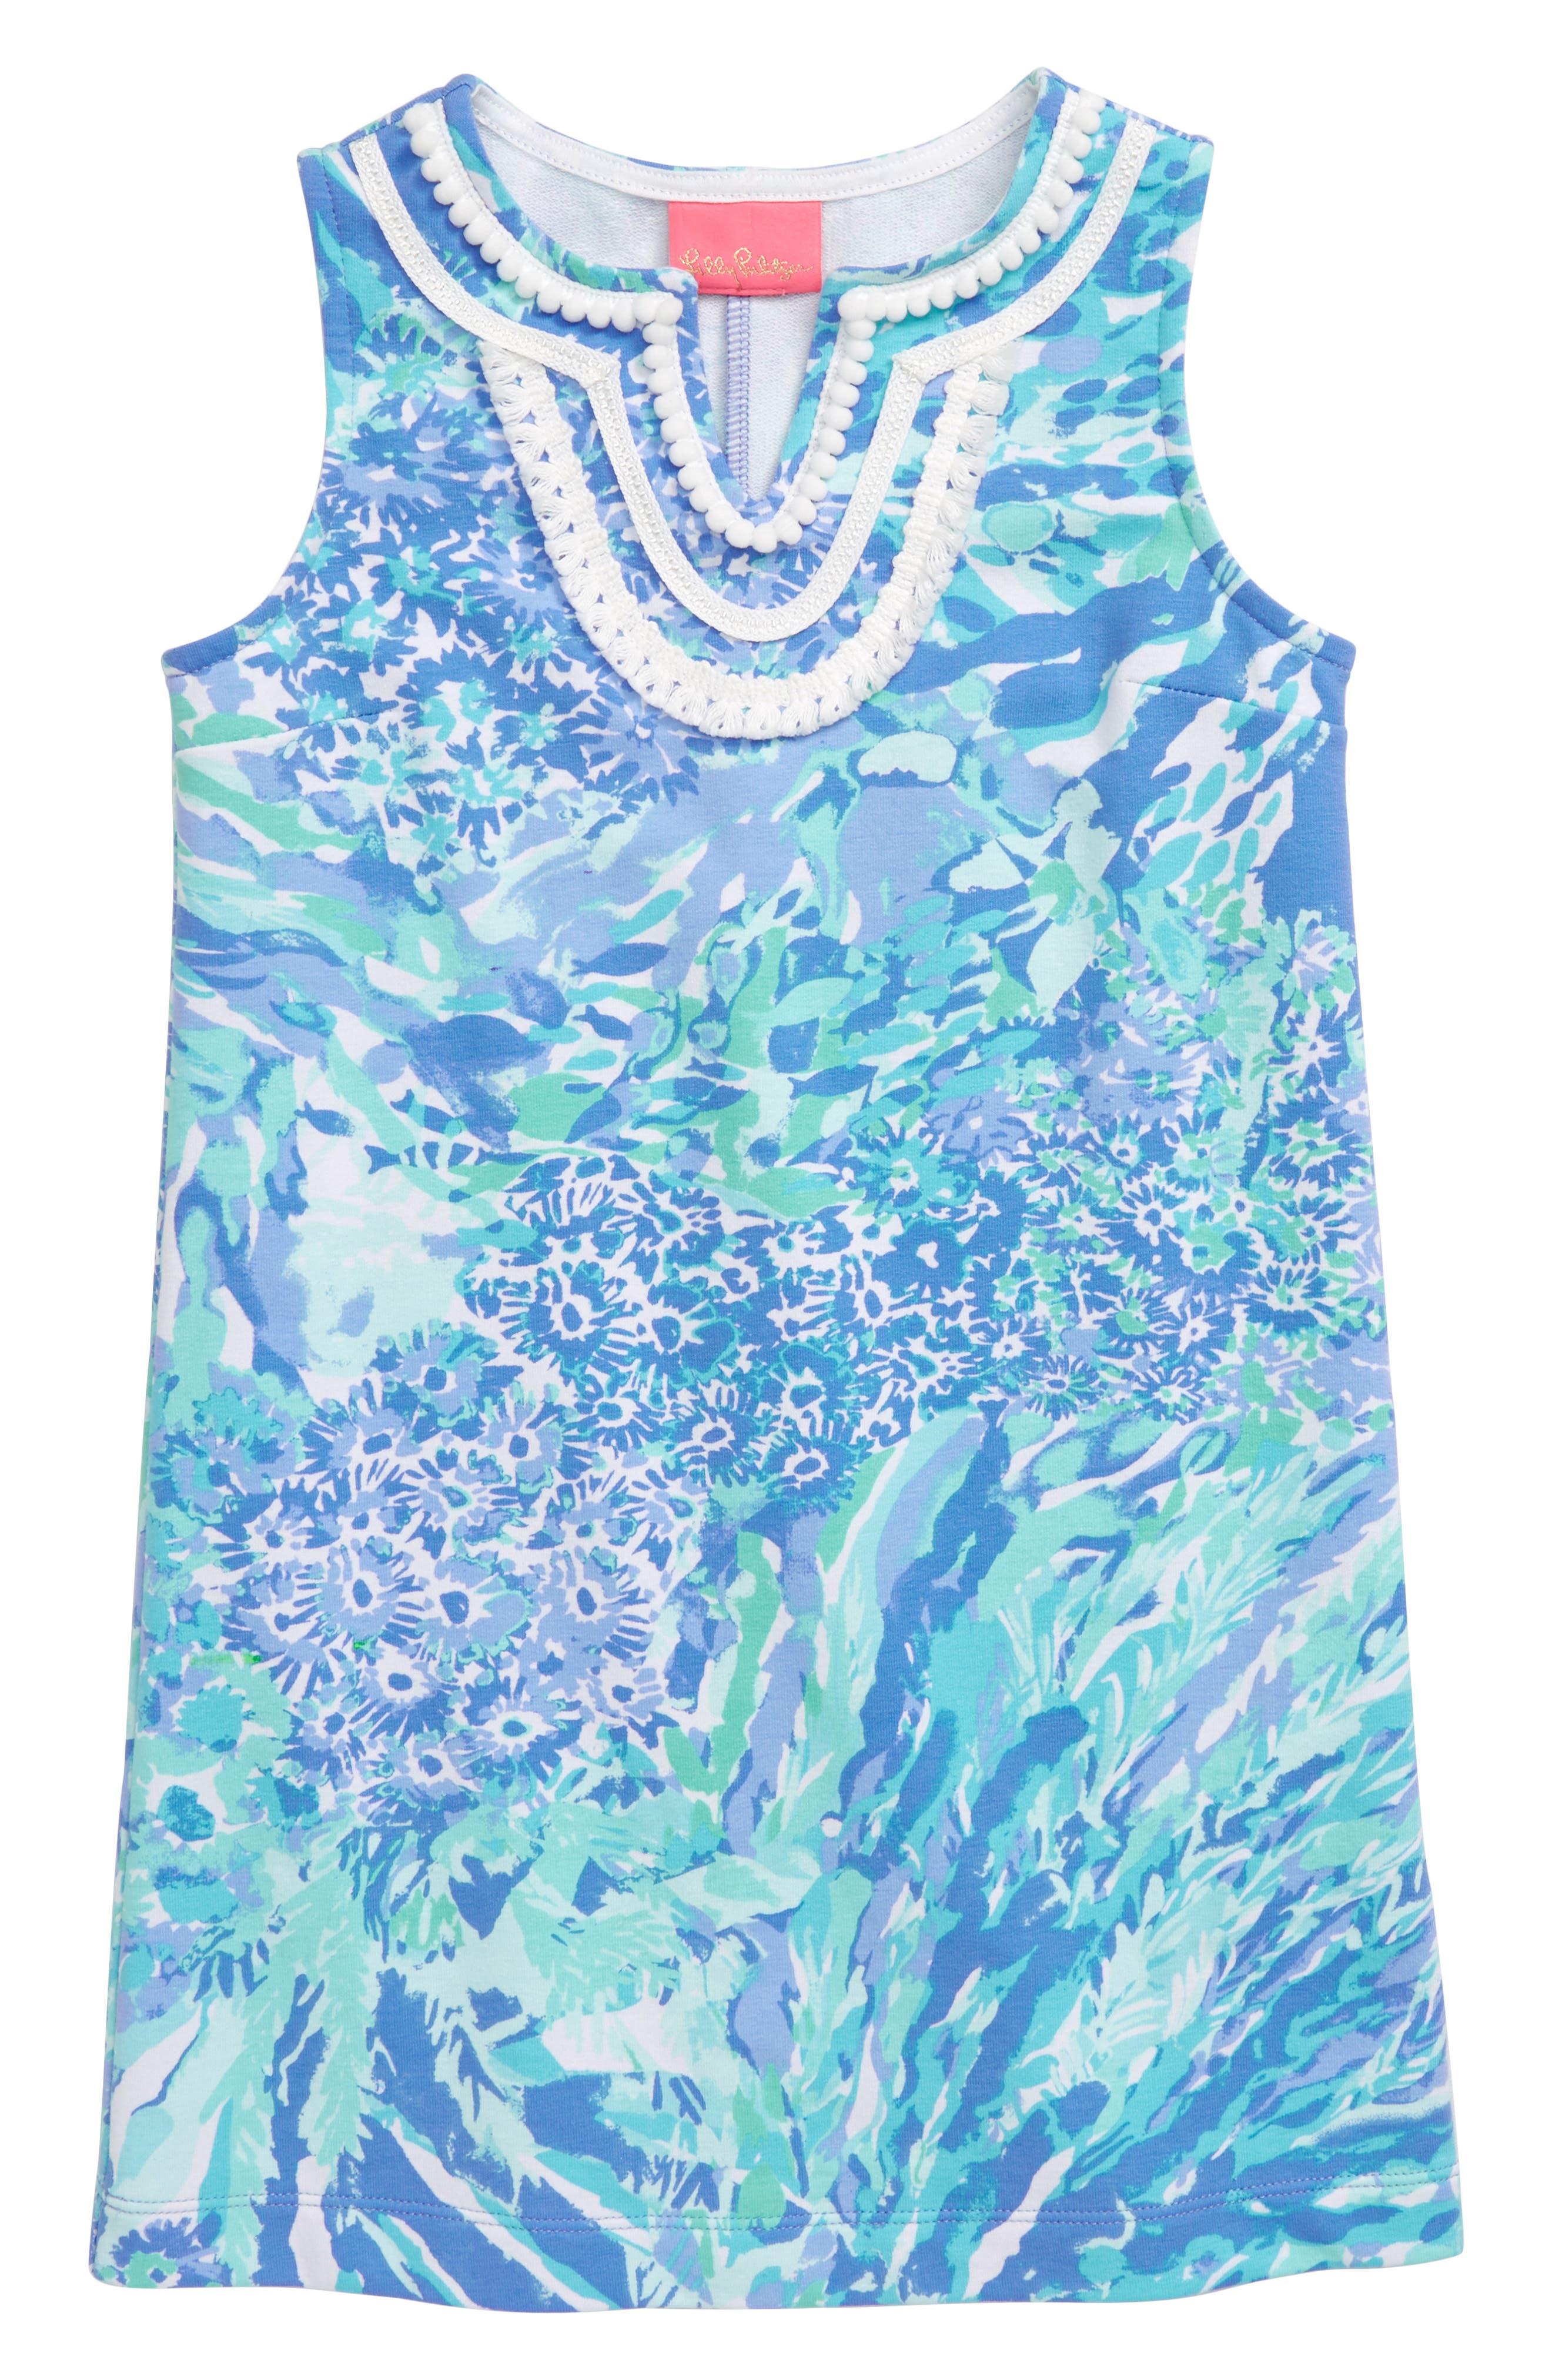 Girls Lilly Pulitzer Mini Harper Shift Dress Size S (45)  Blue